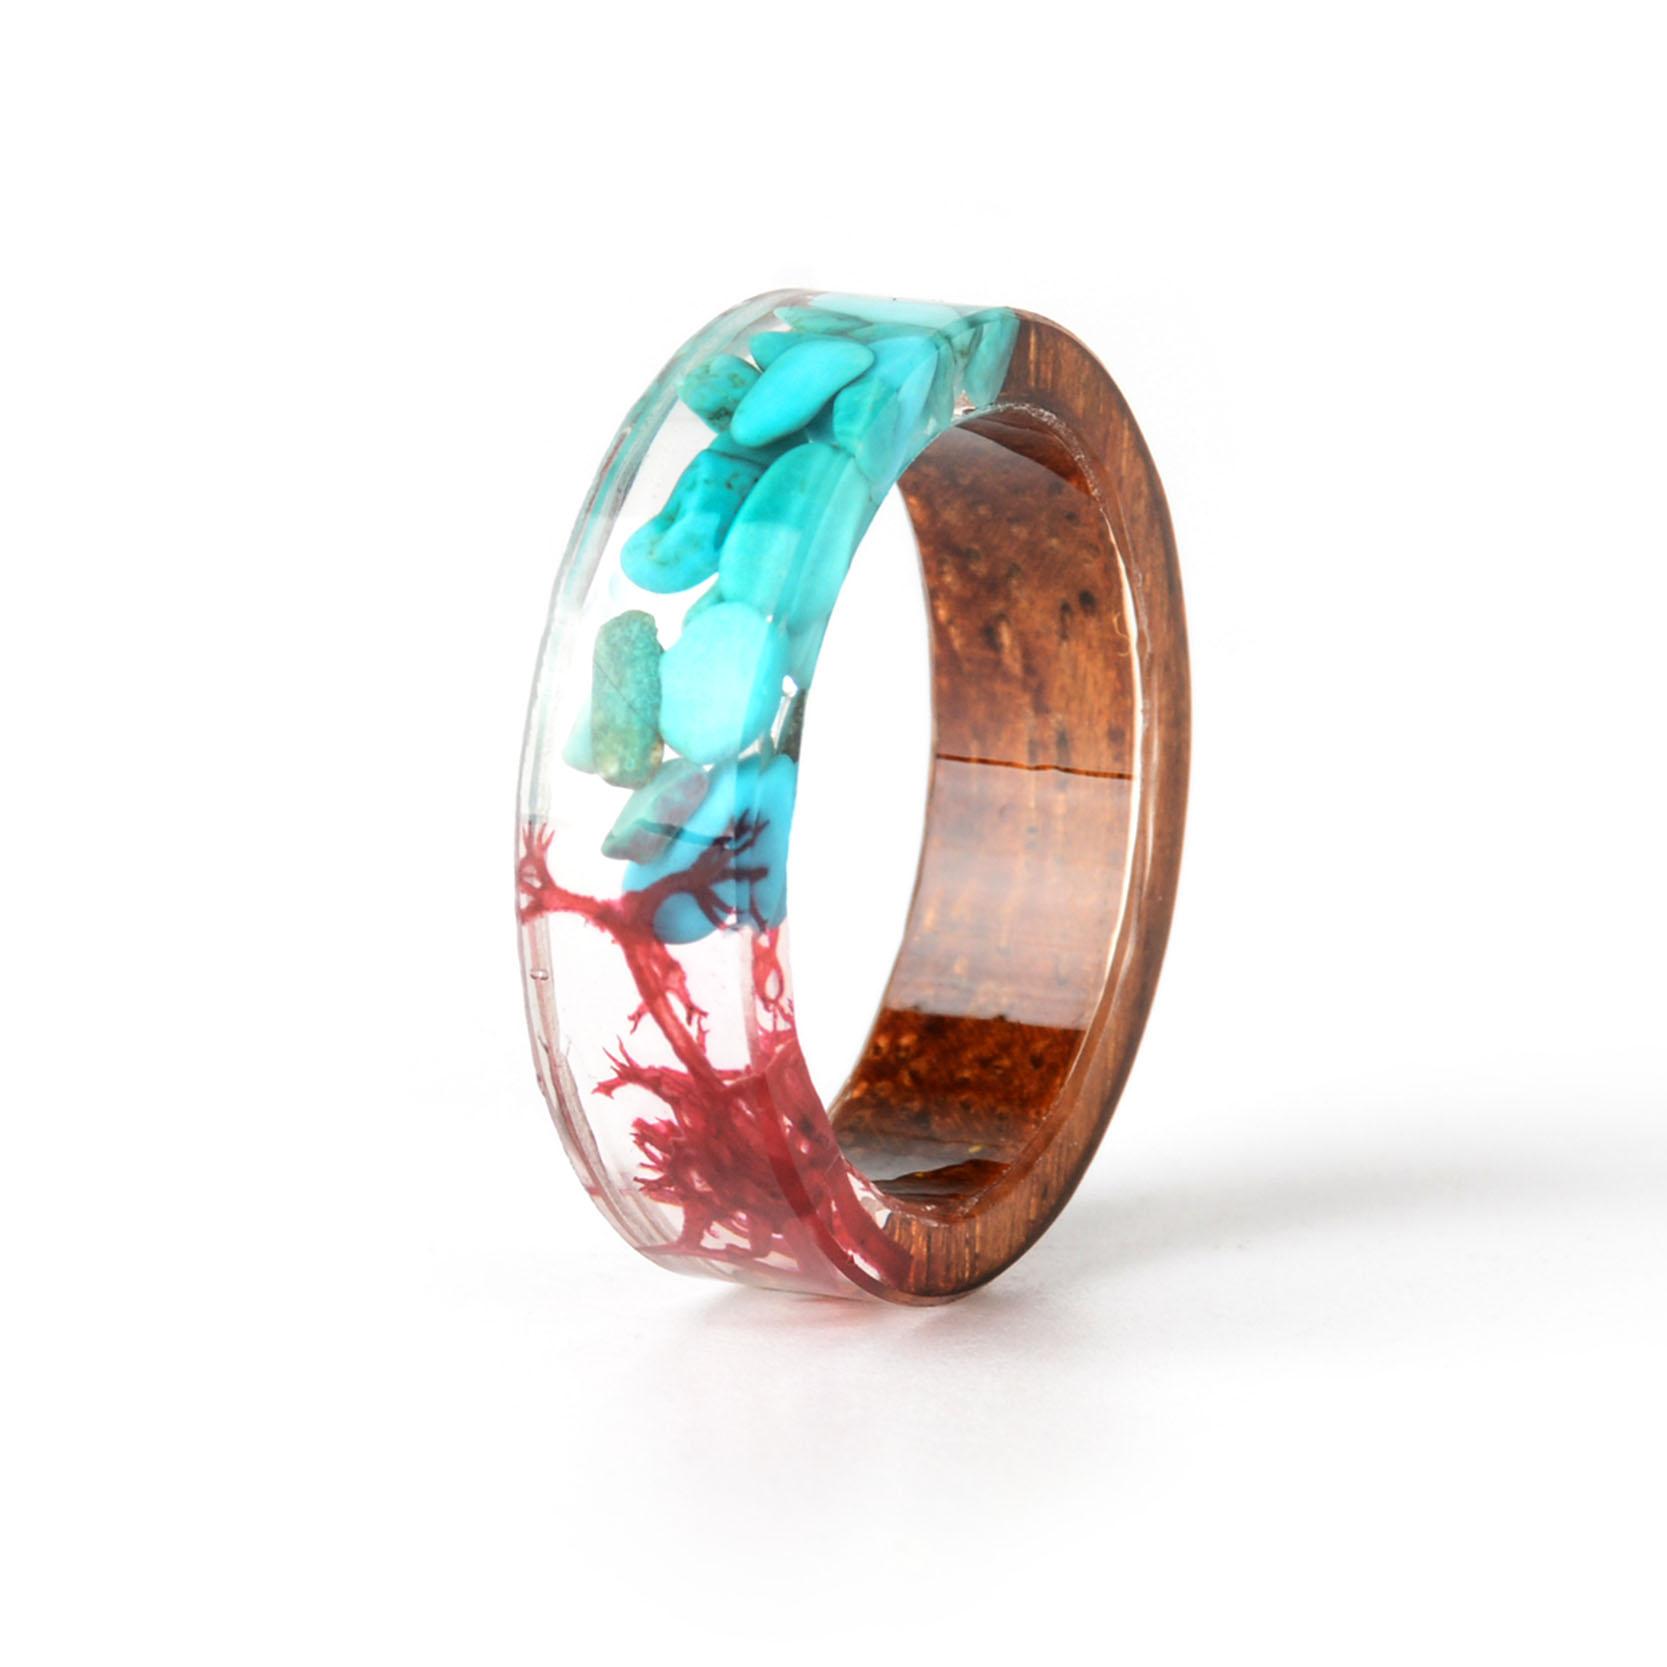 Handmade Wood Resin Ring Many Styles 27